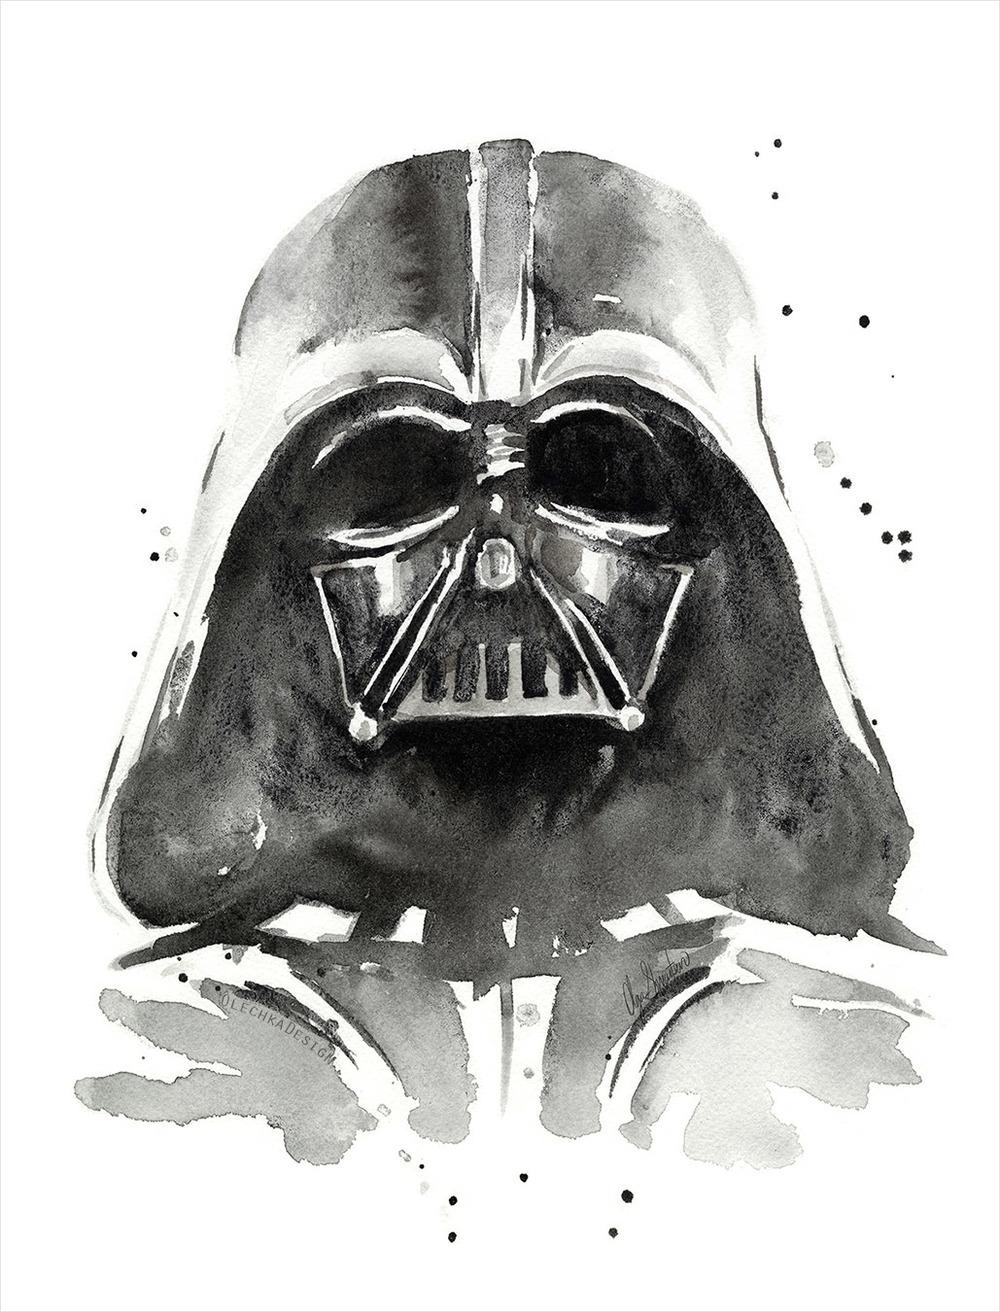 Vader-watercolor.jpg